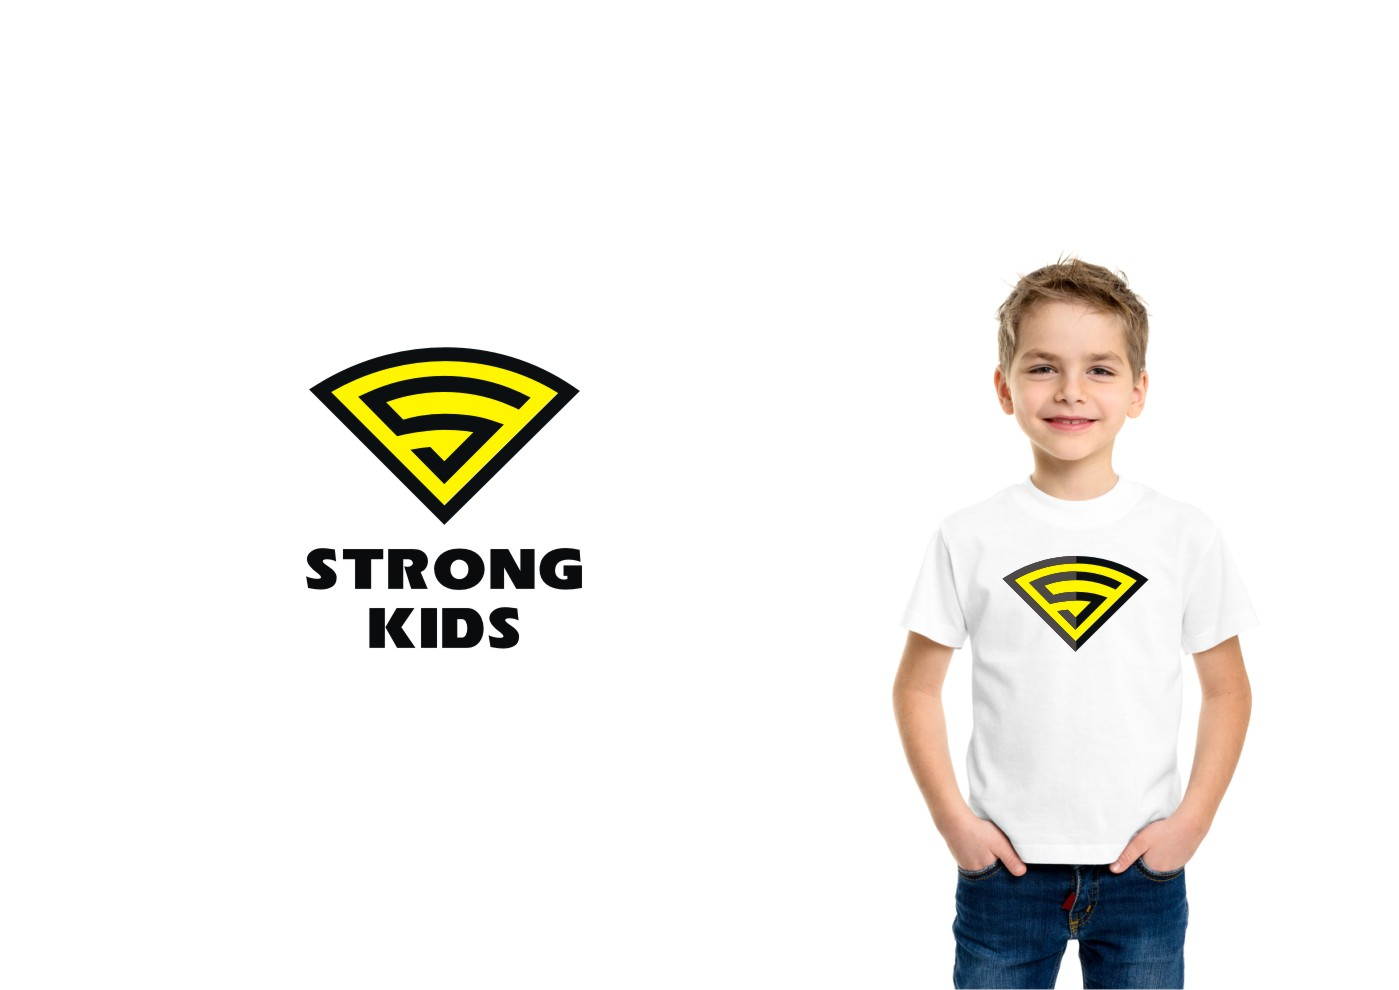 Логотип для Детского Интернет Магазина StrongKids фото f_1445c62996a911e6.jpg